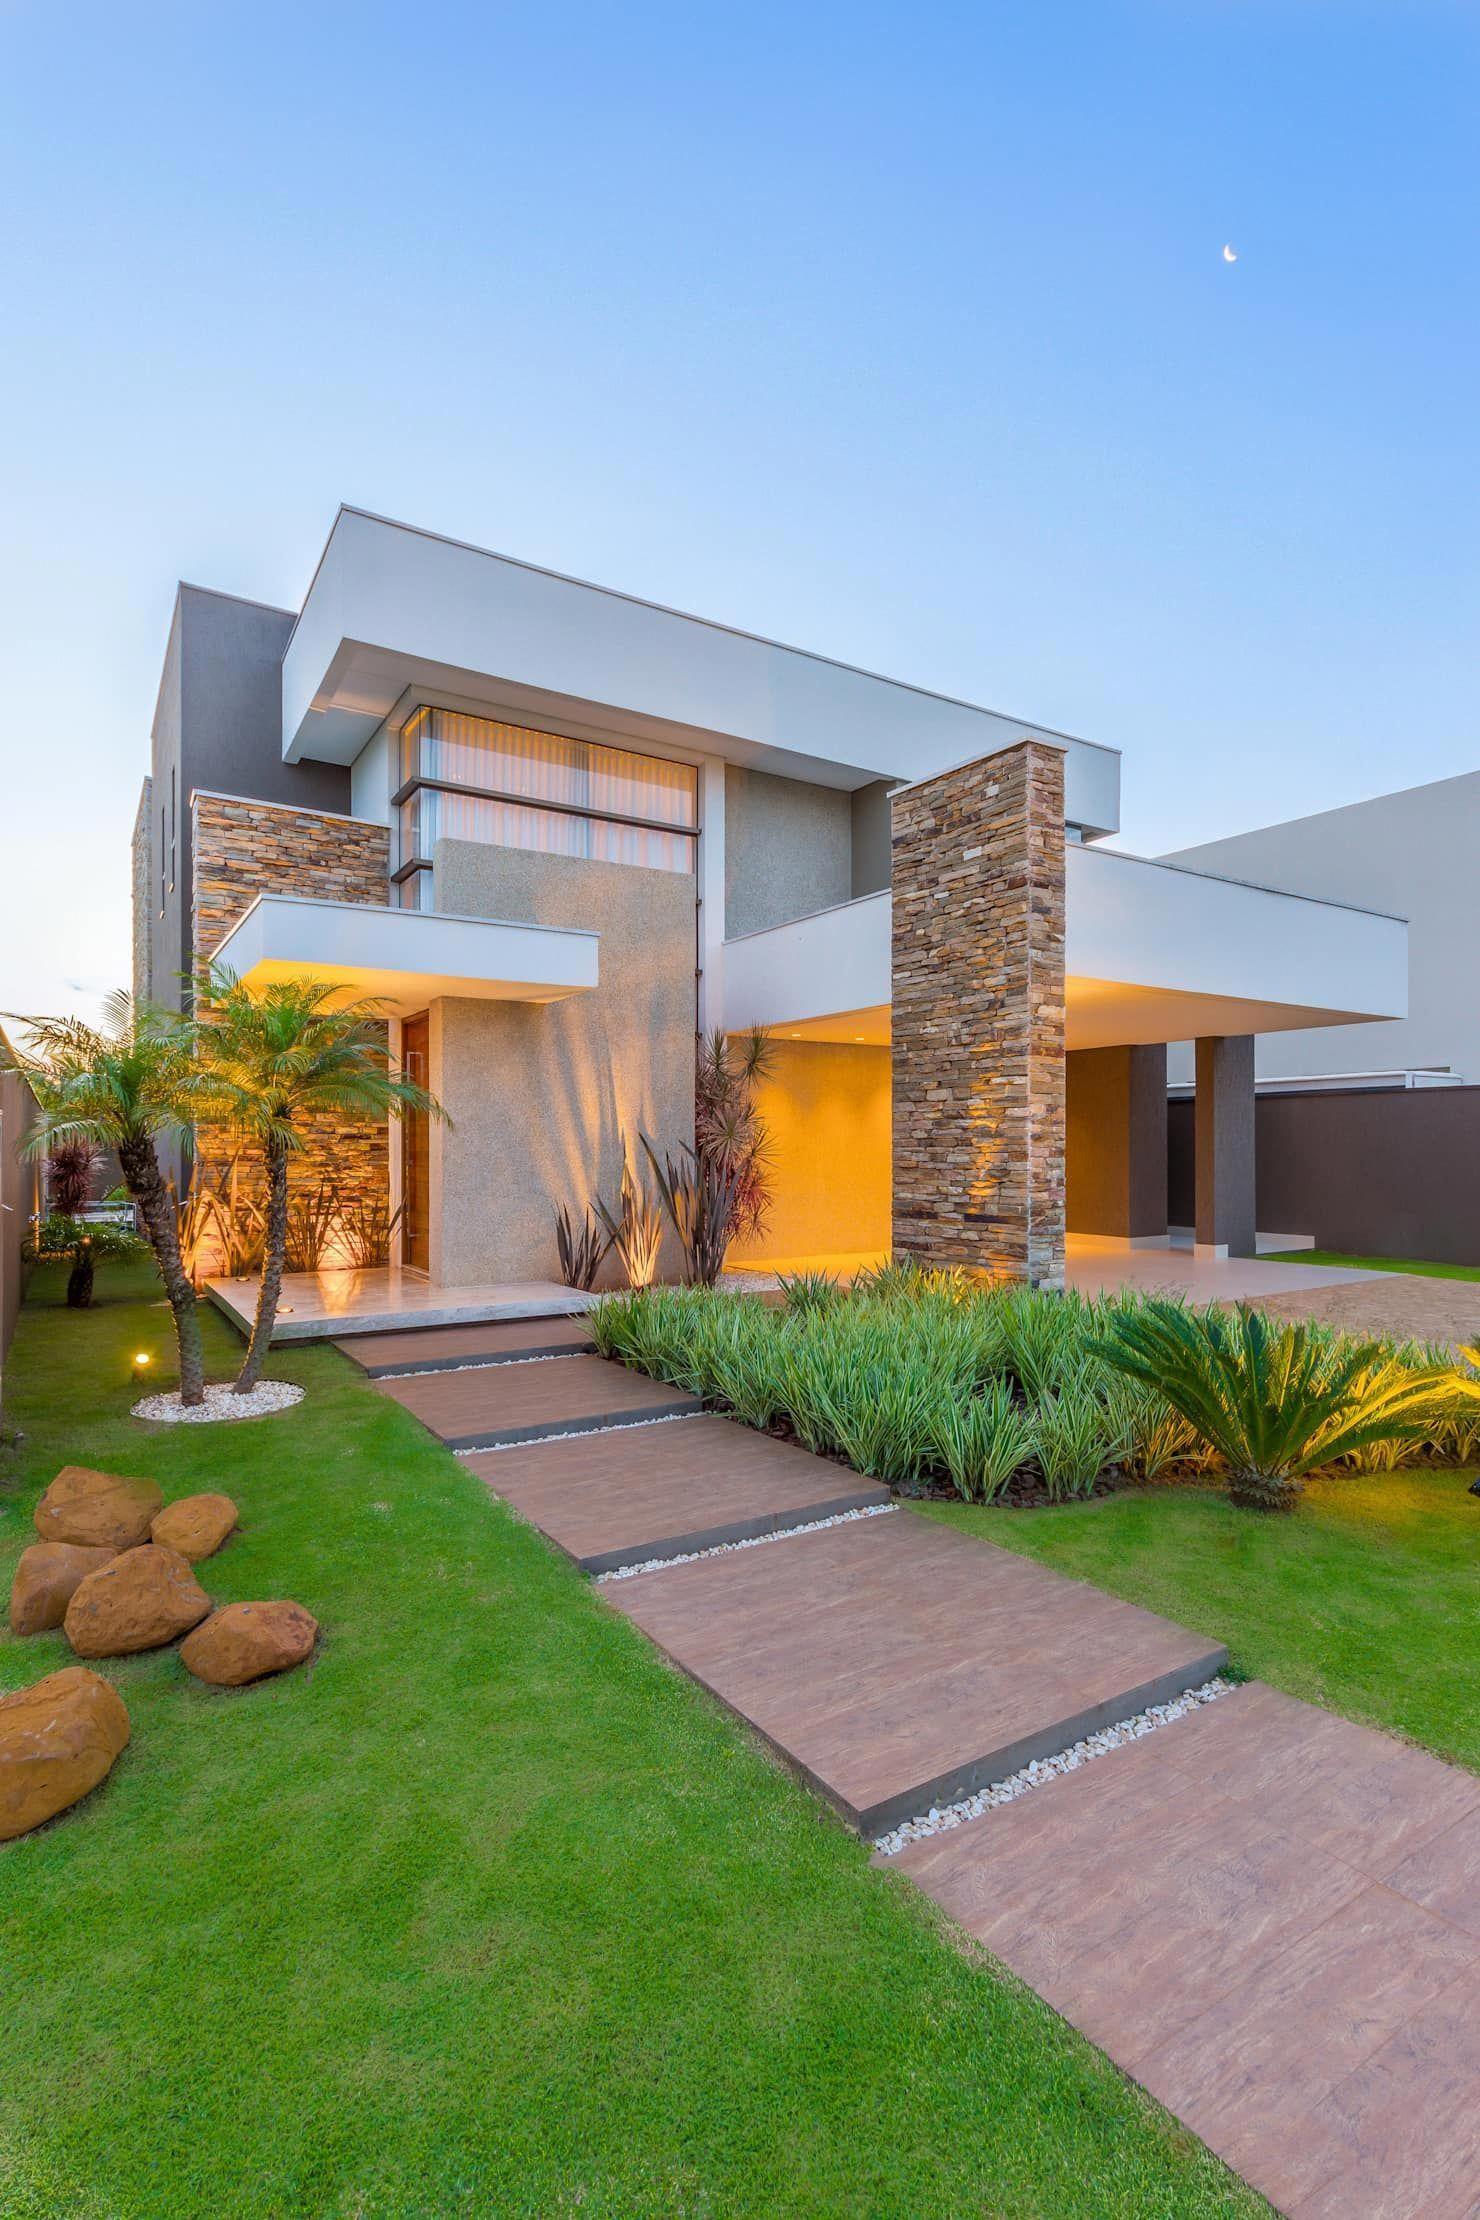 71 Contemporary Exterior Design Photos: Low Priced Furniture #CheapFurnitureWebsites Key: 2434073077